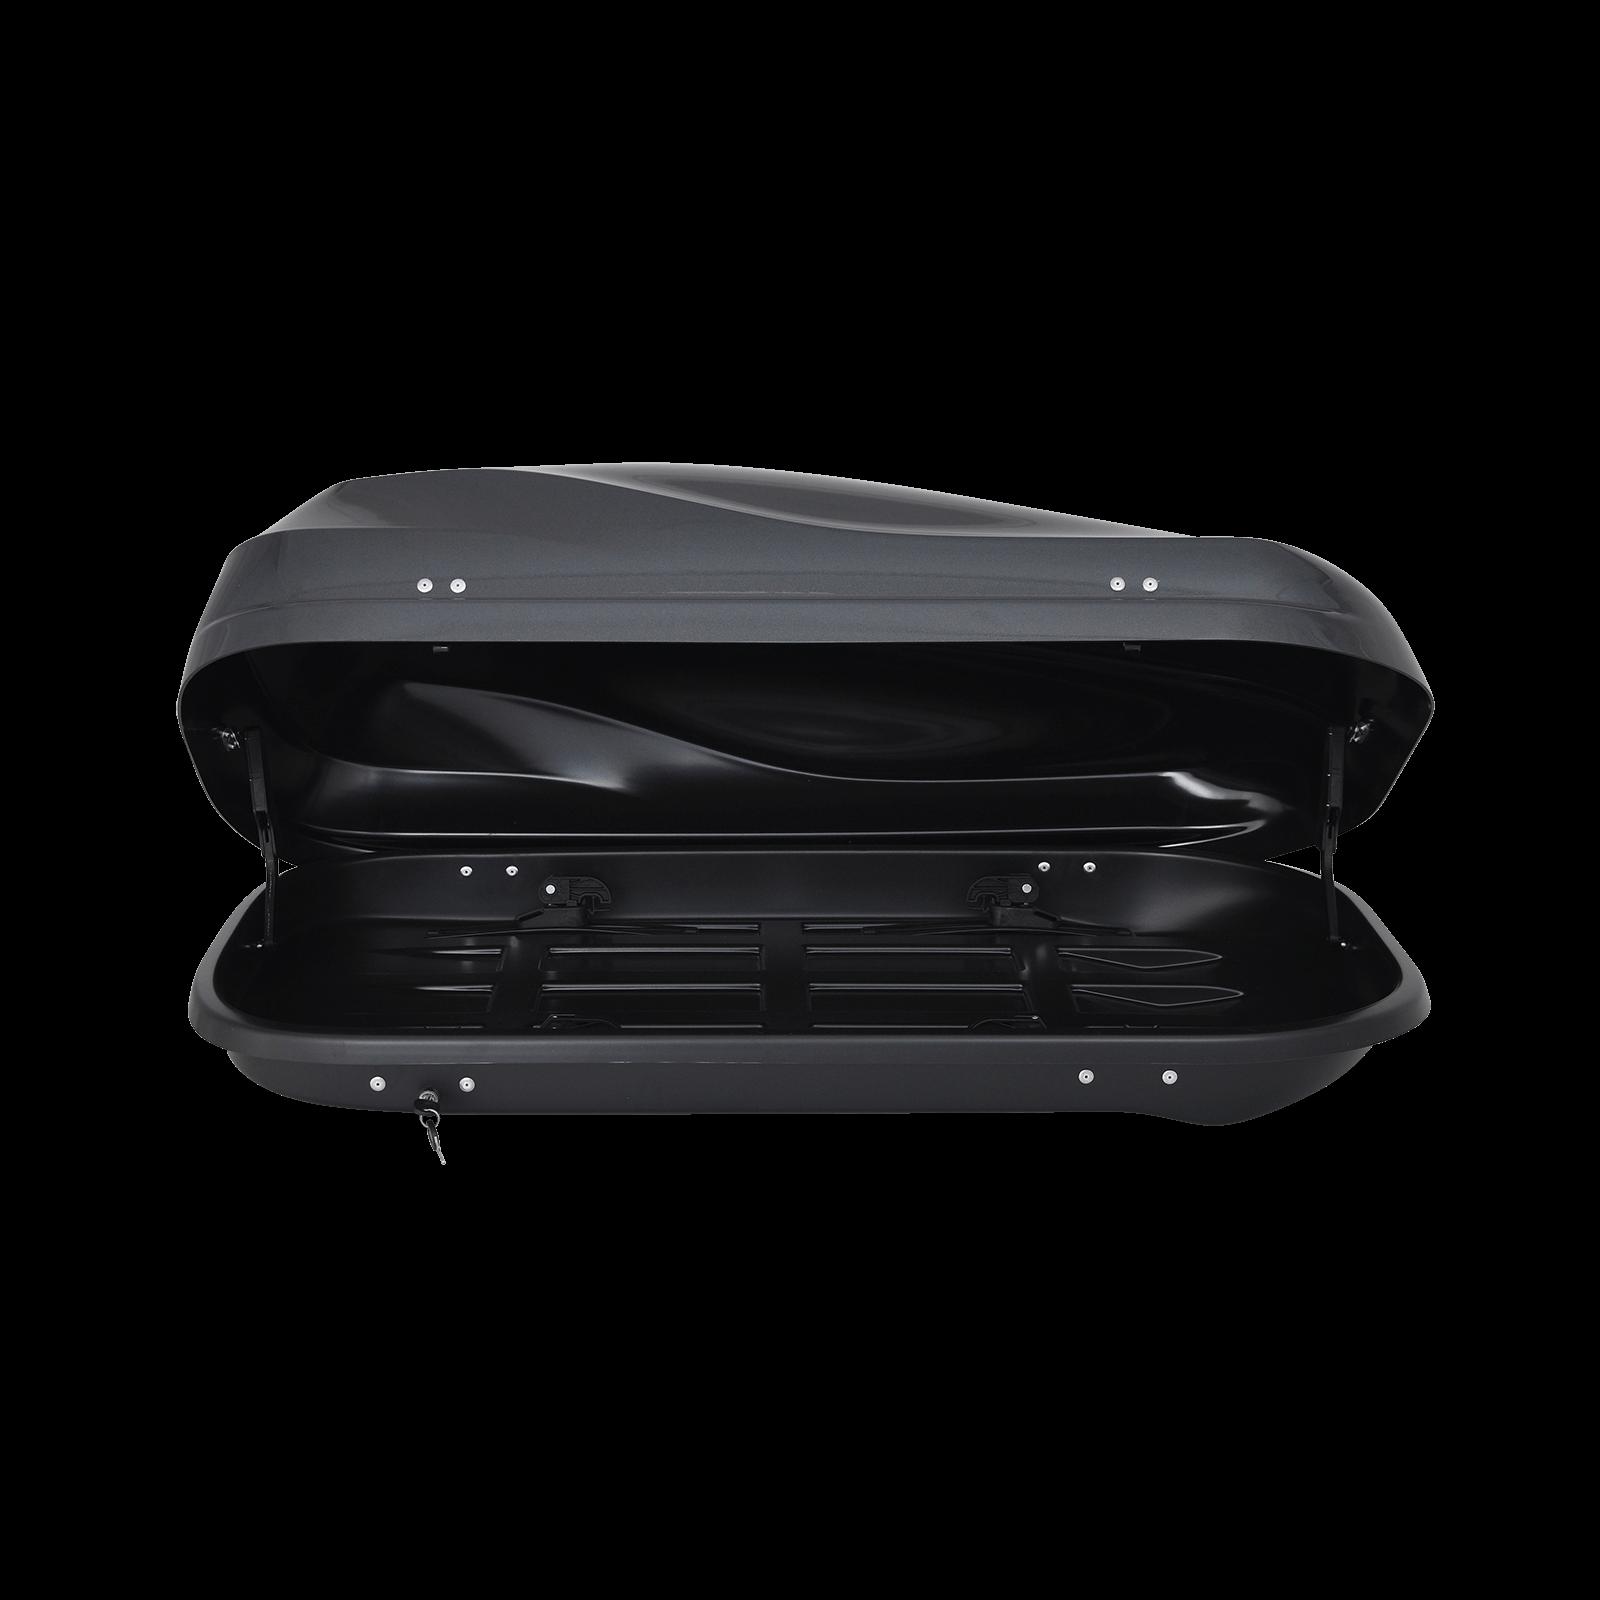 Dachbox Junior Altro 370 grau glänzend - Bild 2